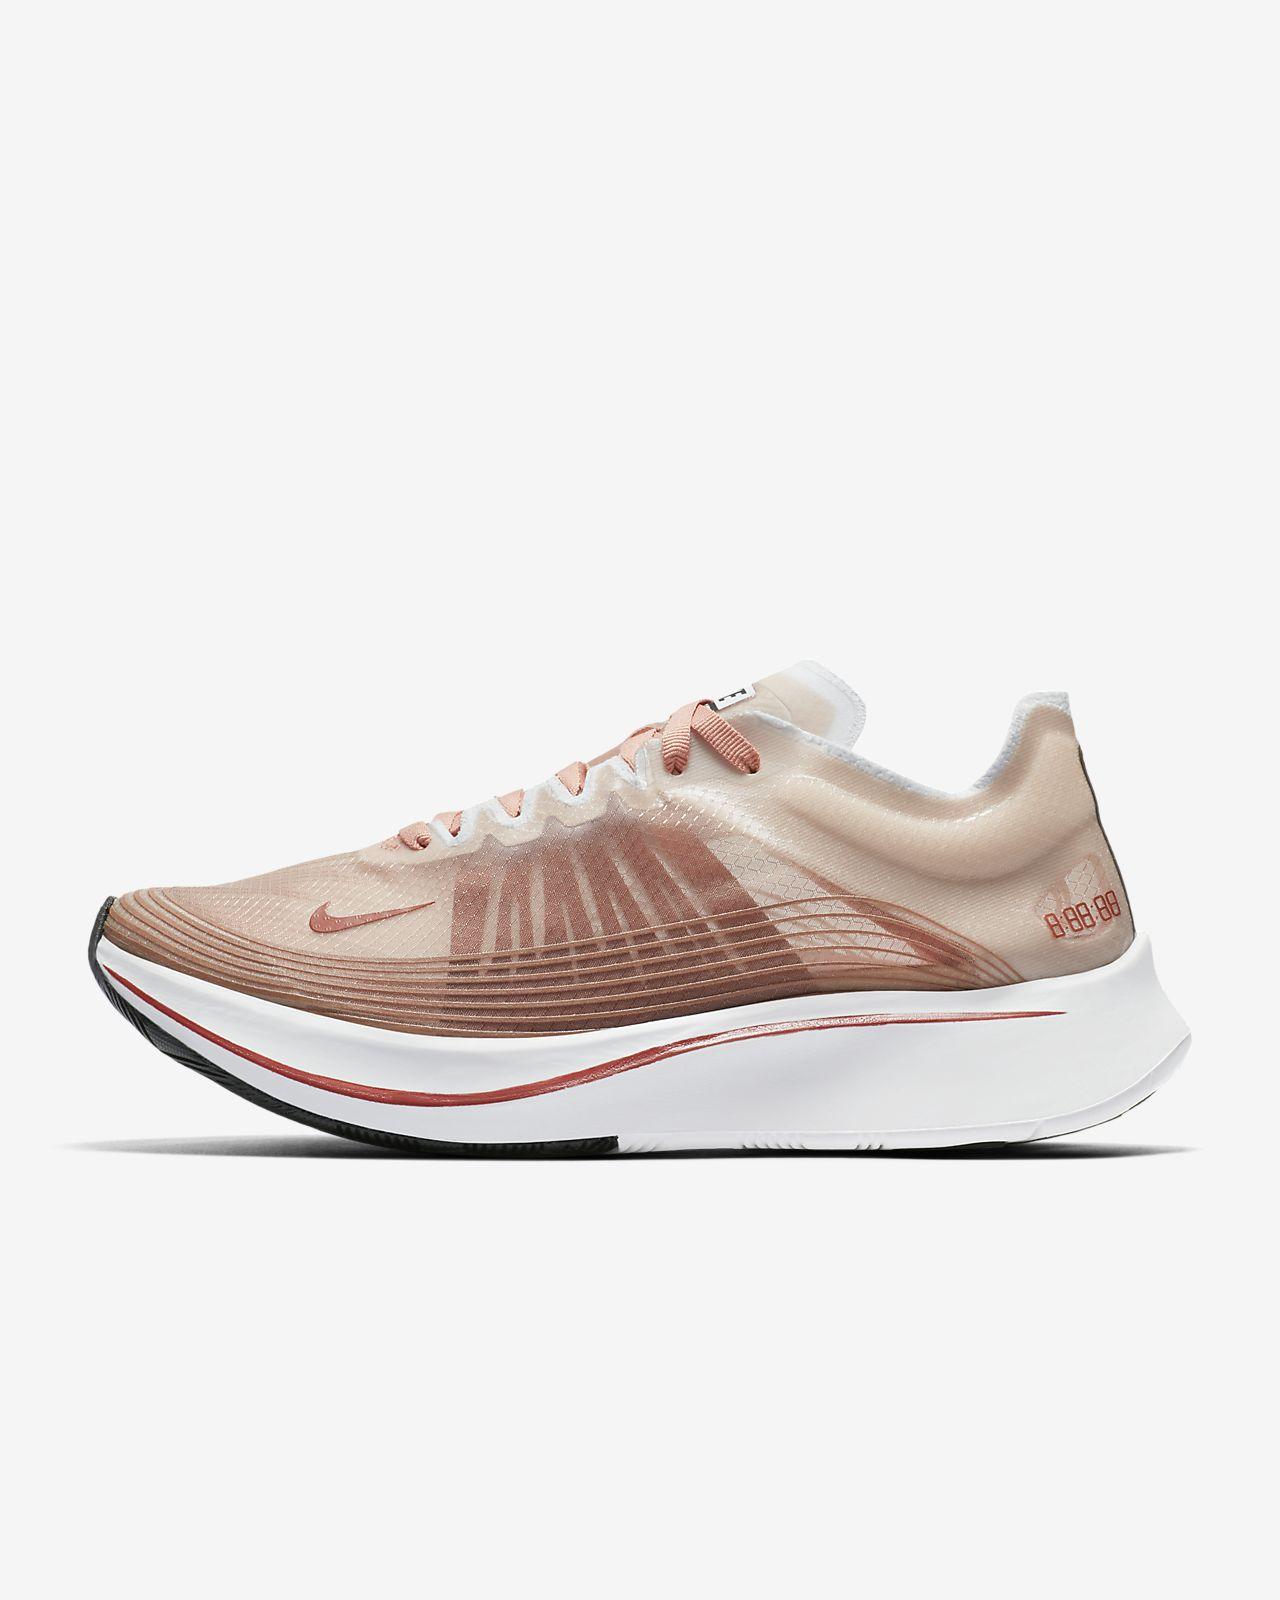 timeless design 99b6b 1c4eb Women s Running Shoe. Nike Zoom Fly SP